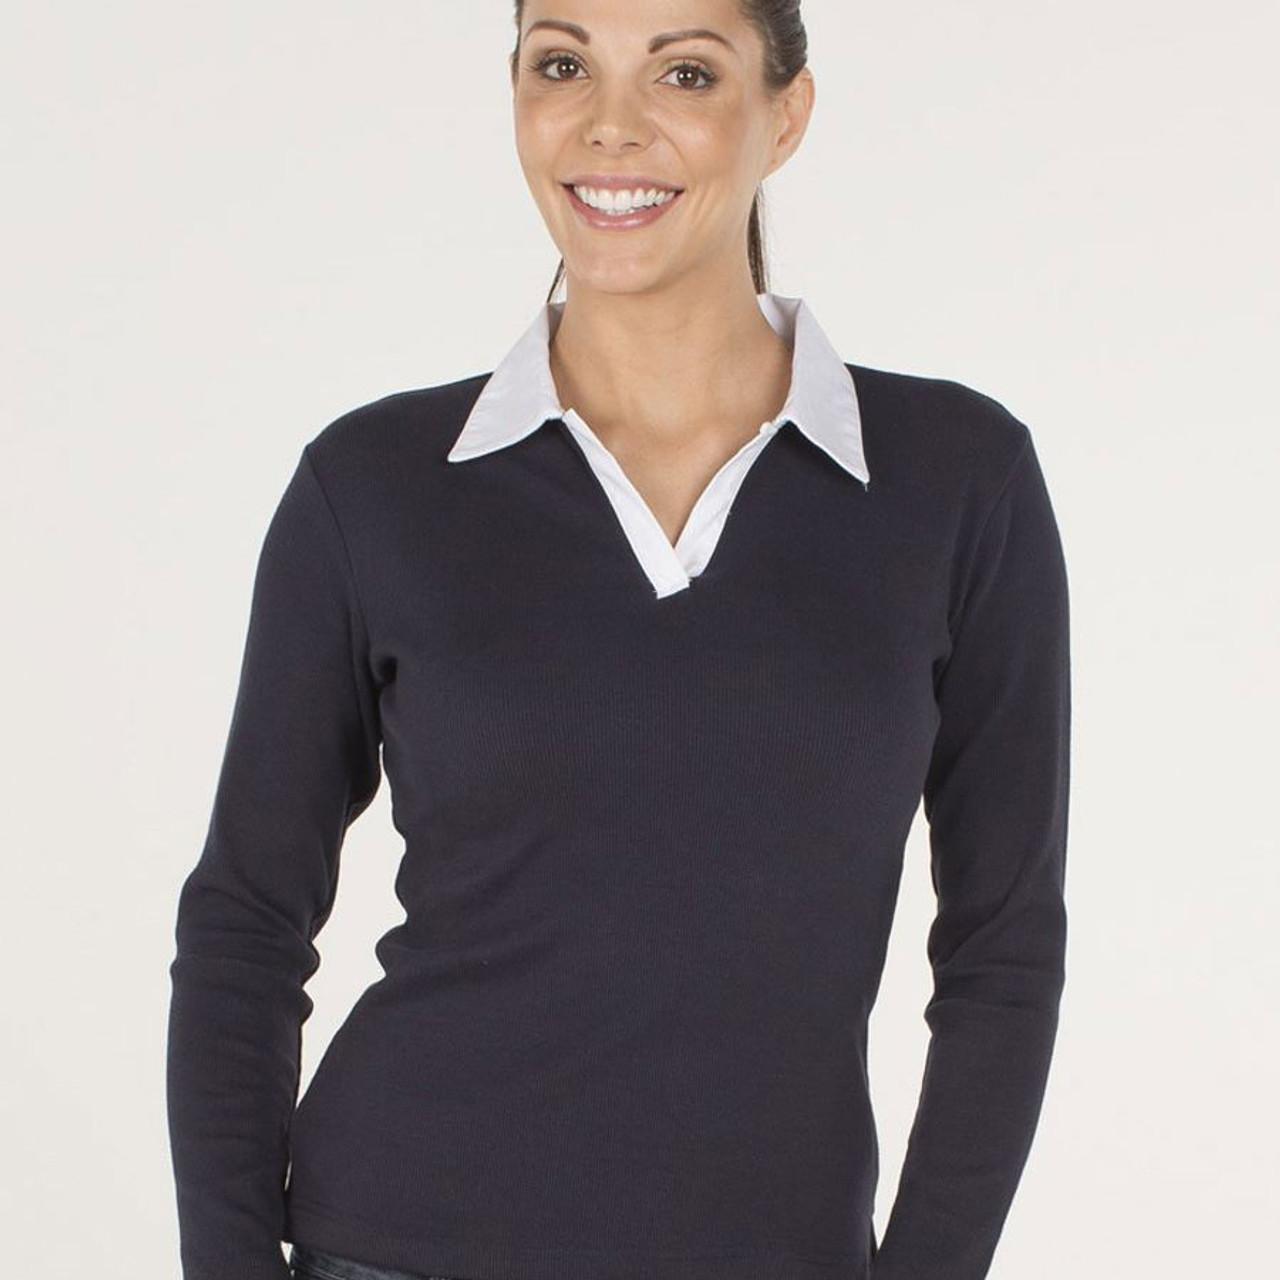 ac9e6bf5 RUGBY SHIRT   plain womens polo online   buy fashion clothing   ladies top    Plus Size Polos